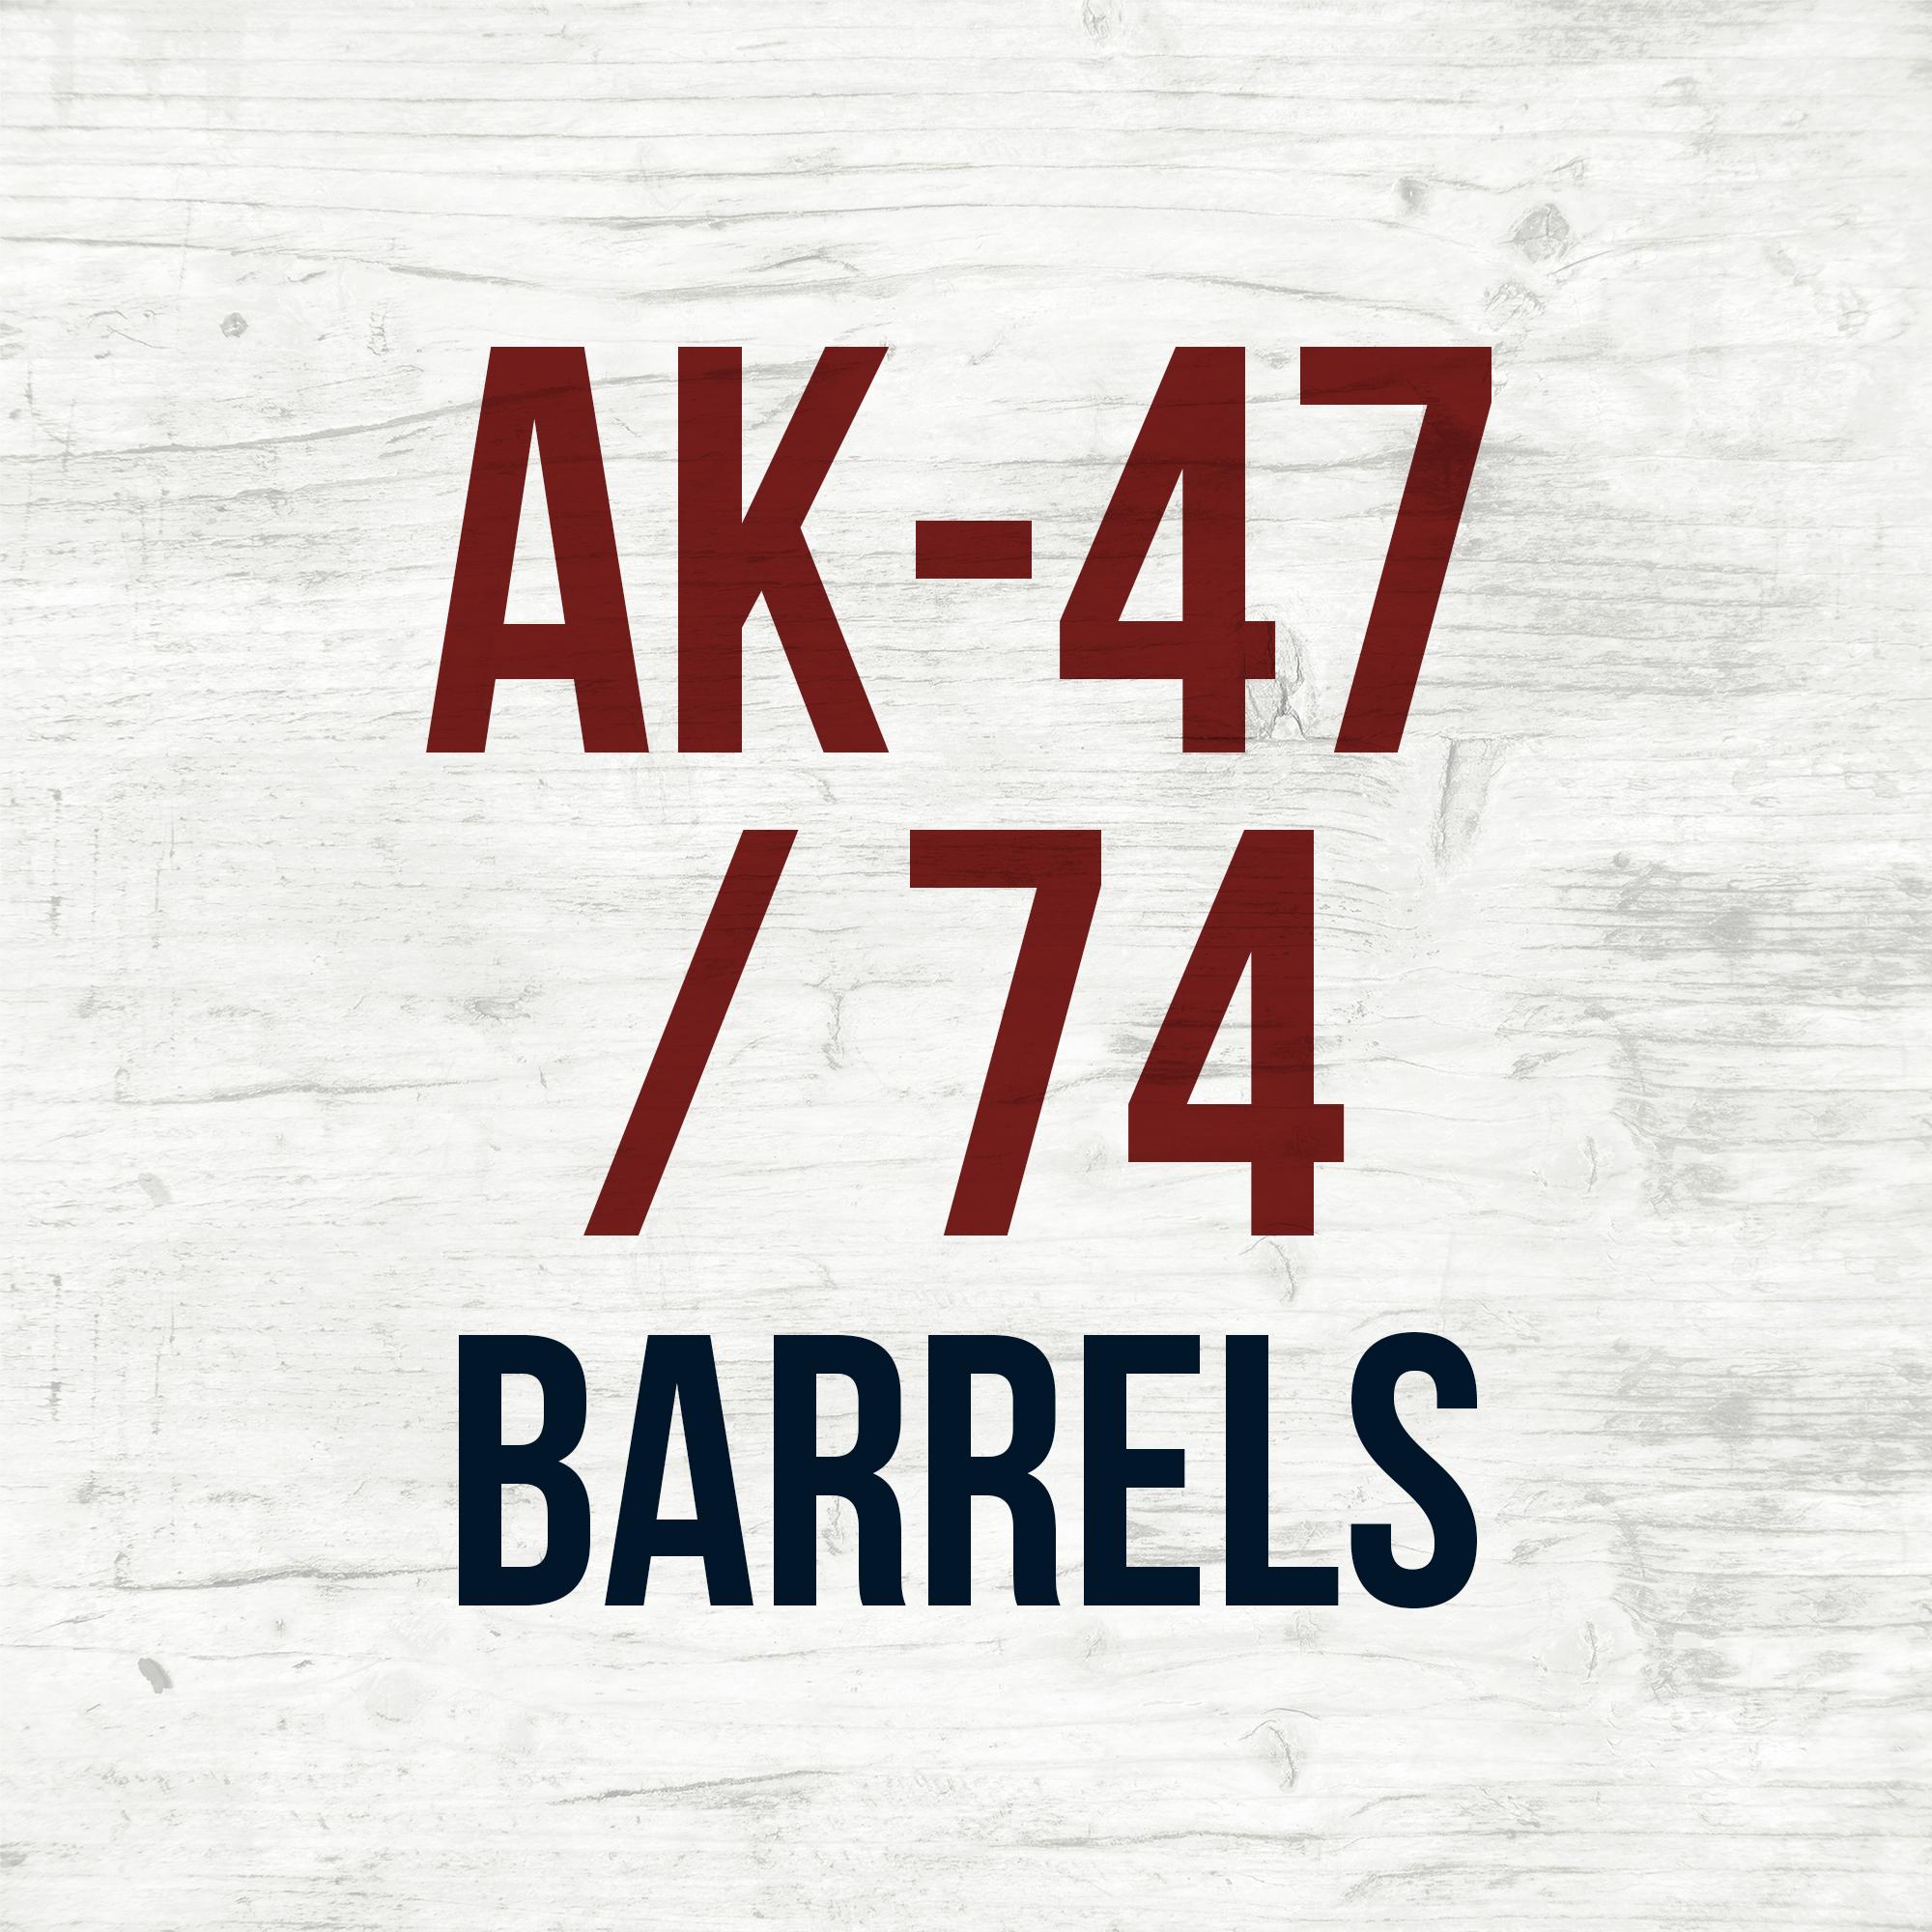 AK-47 / 74